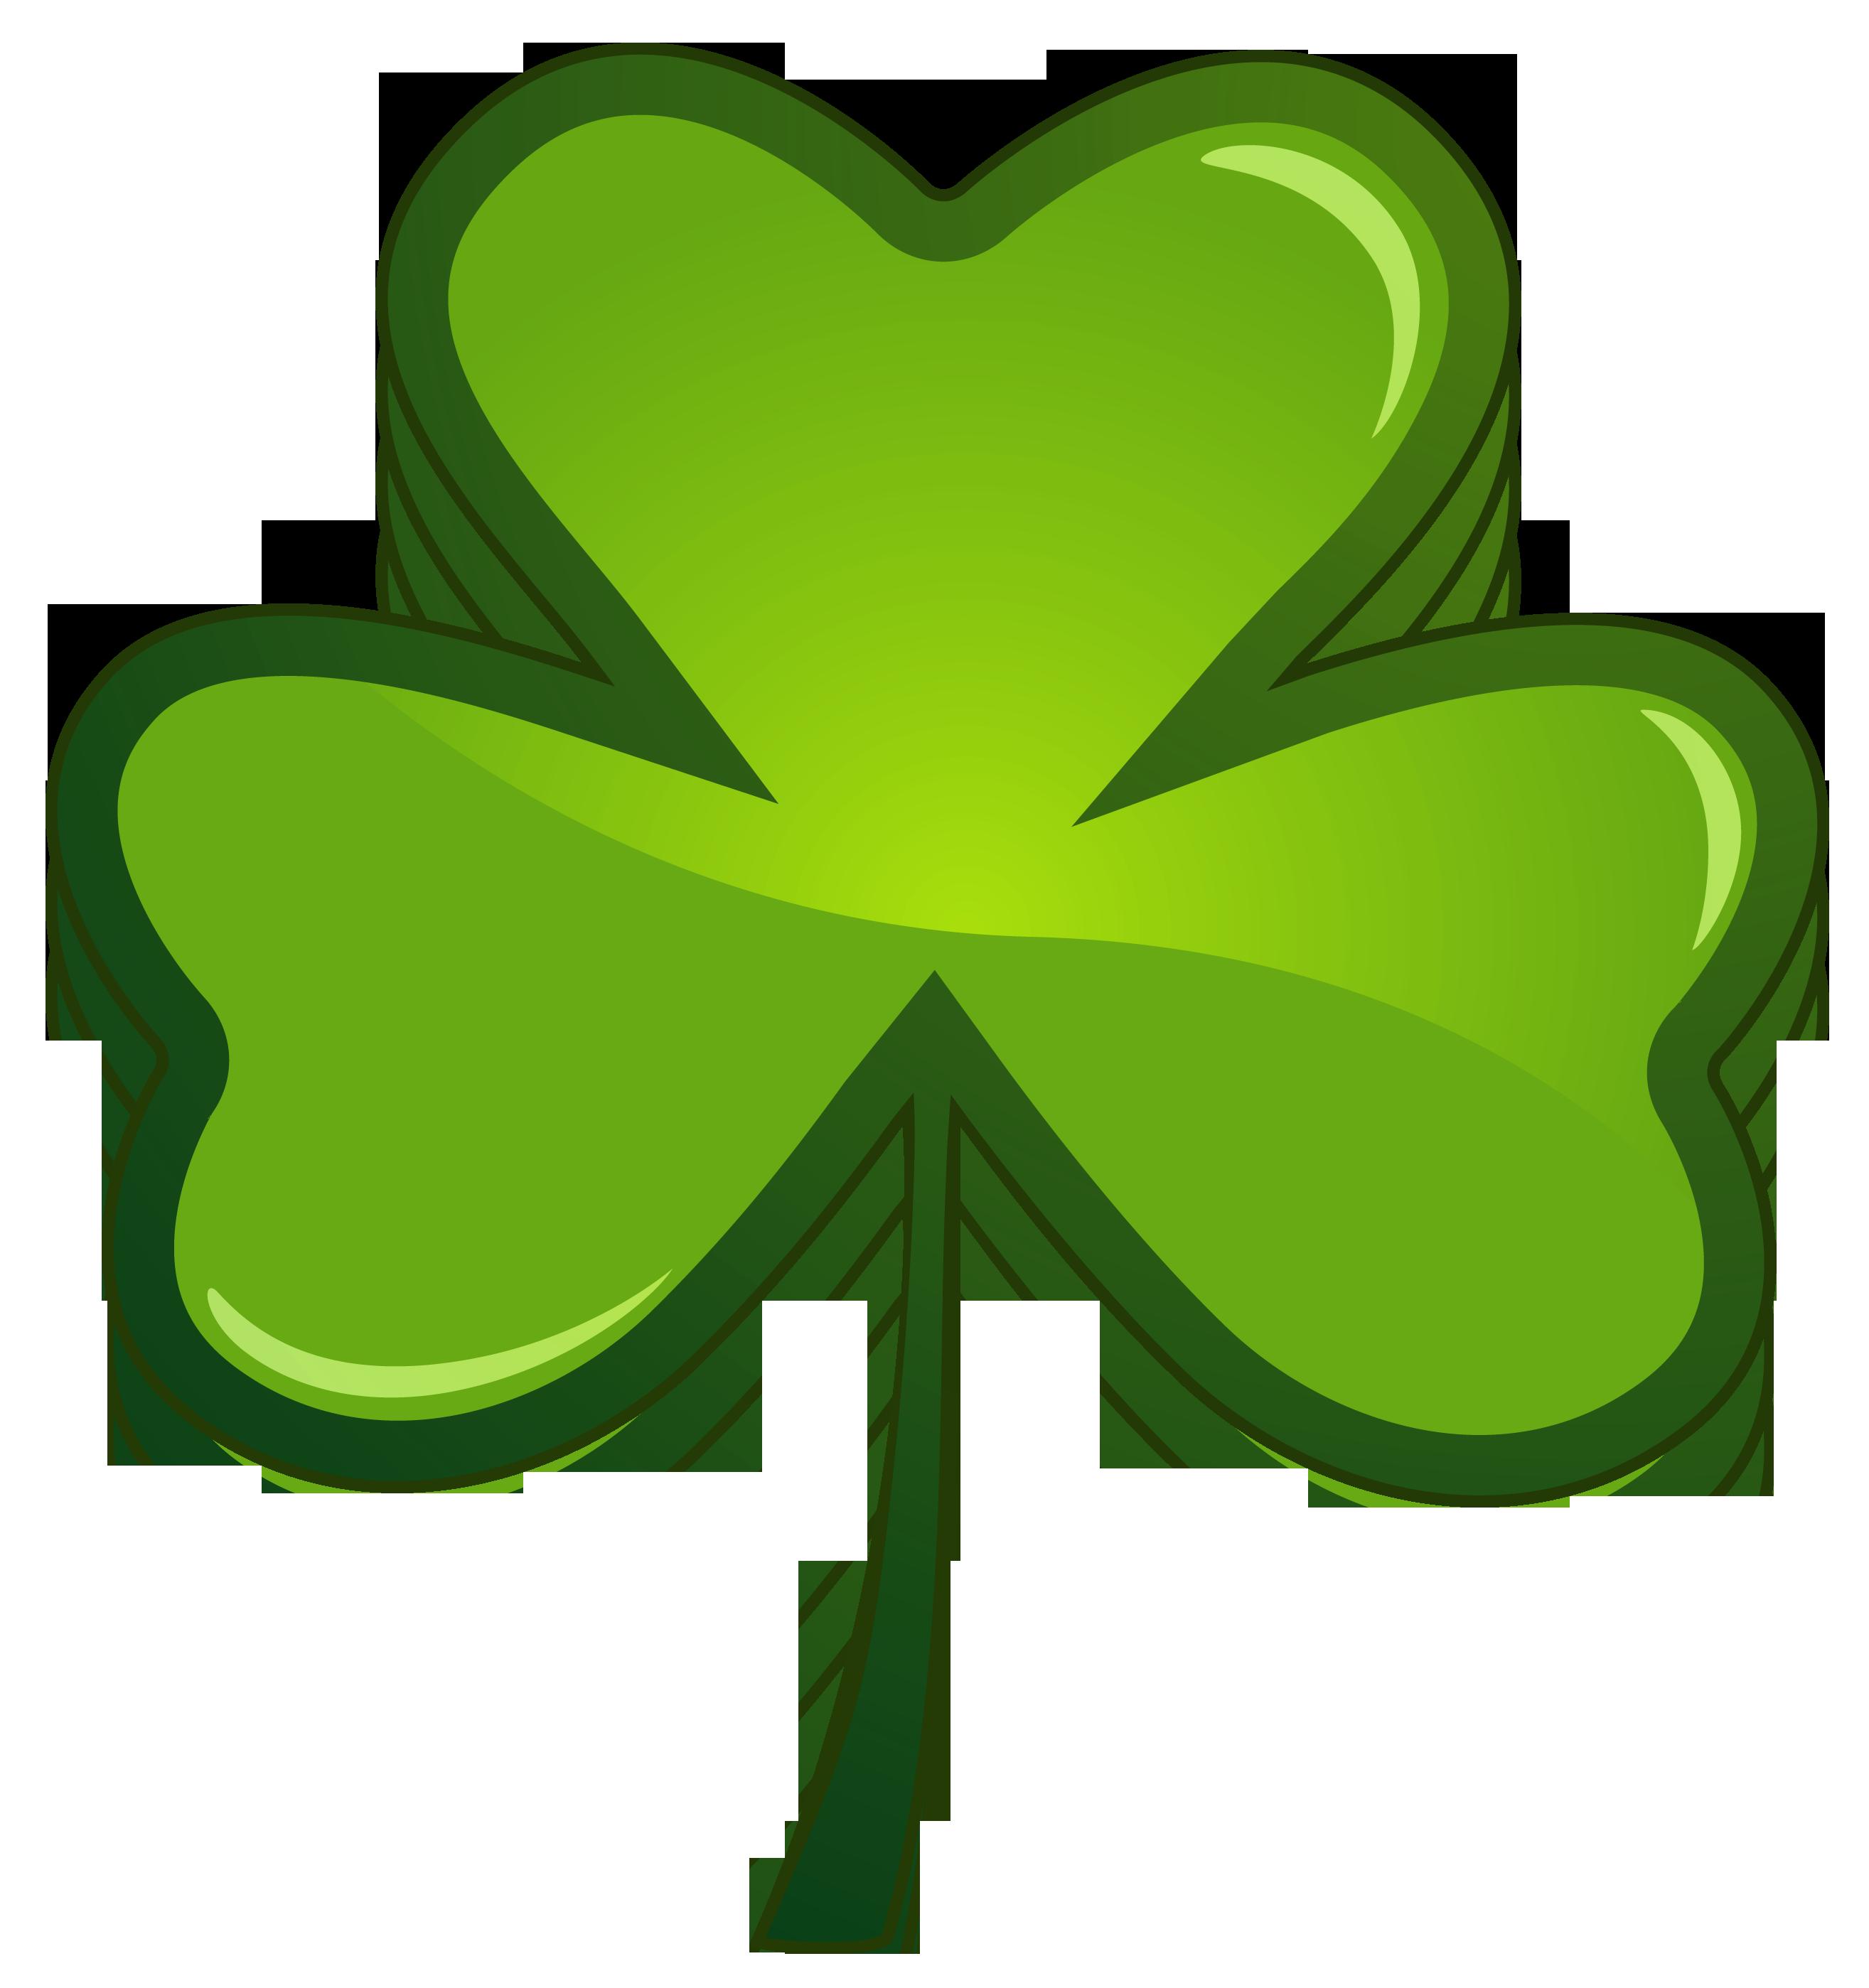 St Patricks Day St Patrick Cliparts 5.